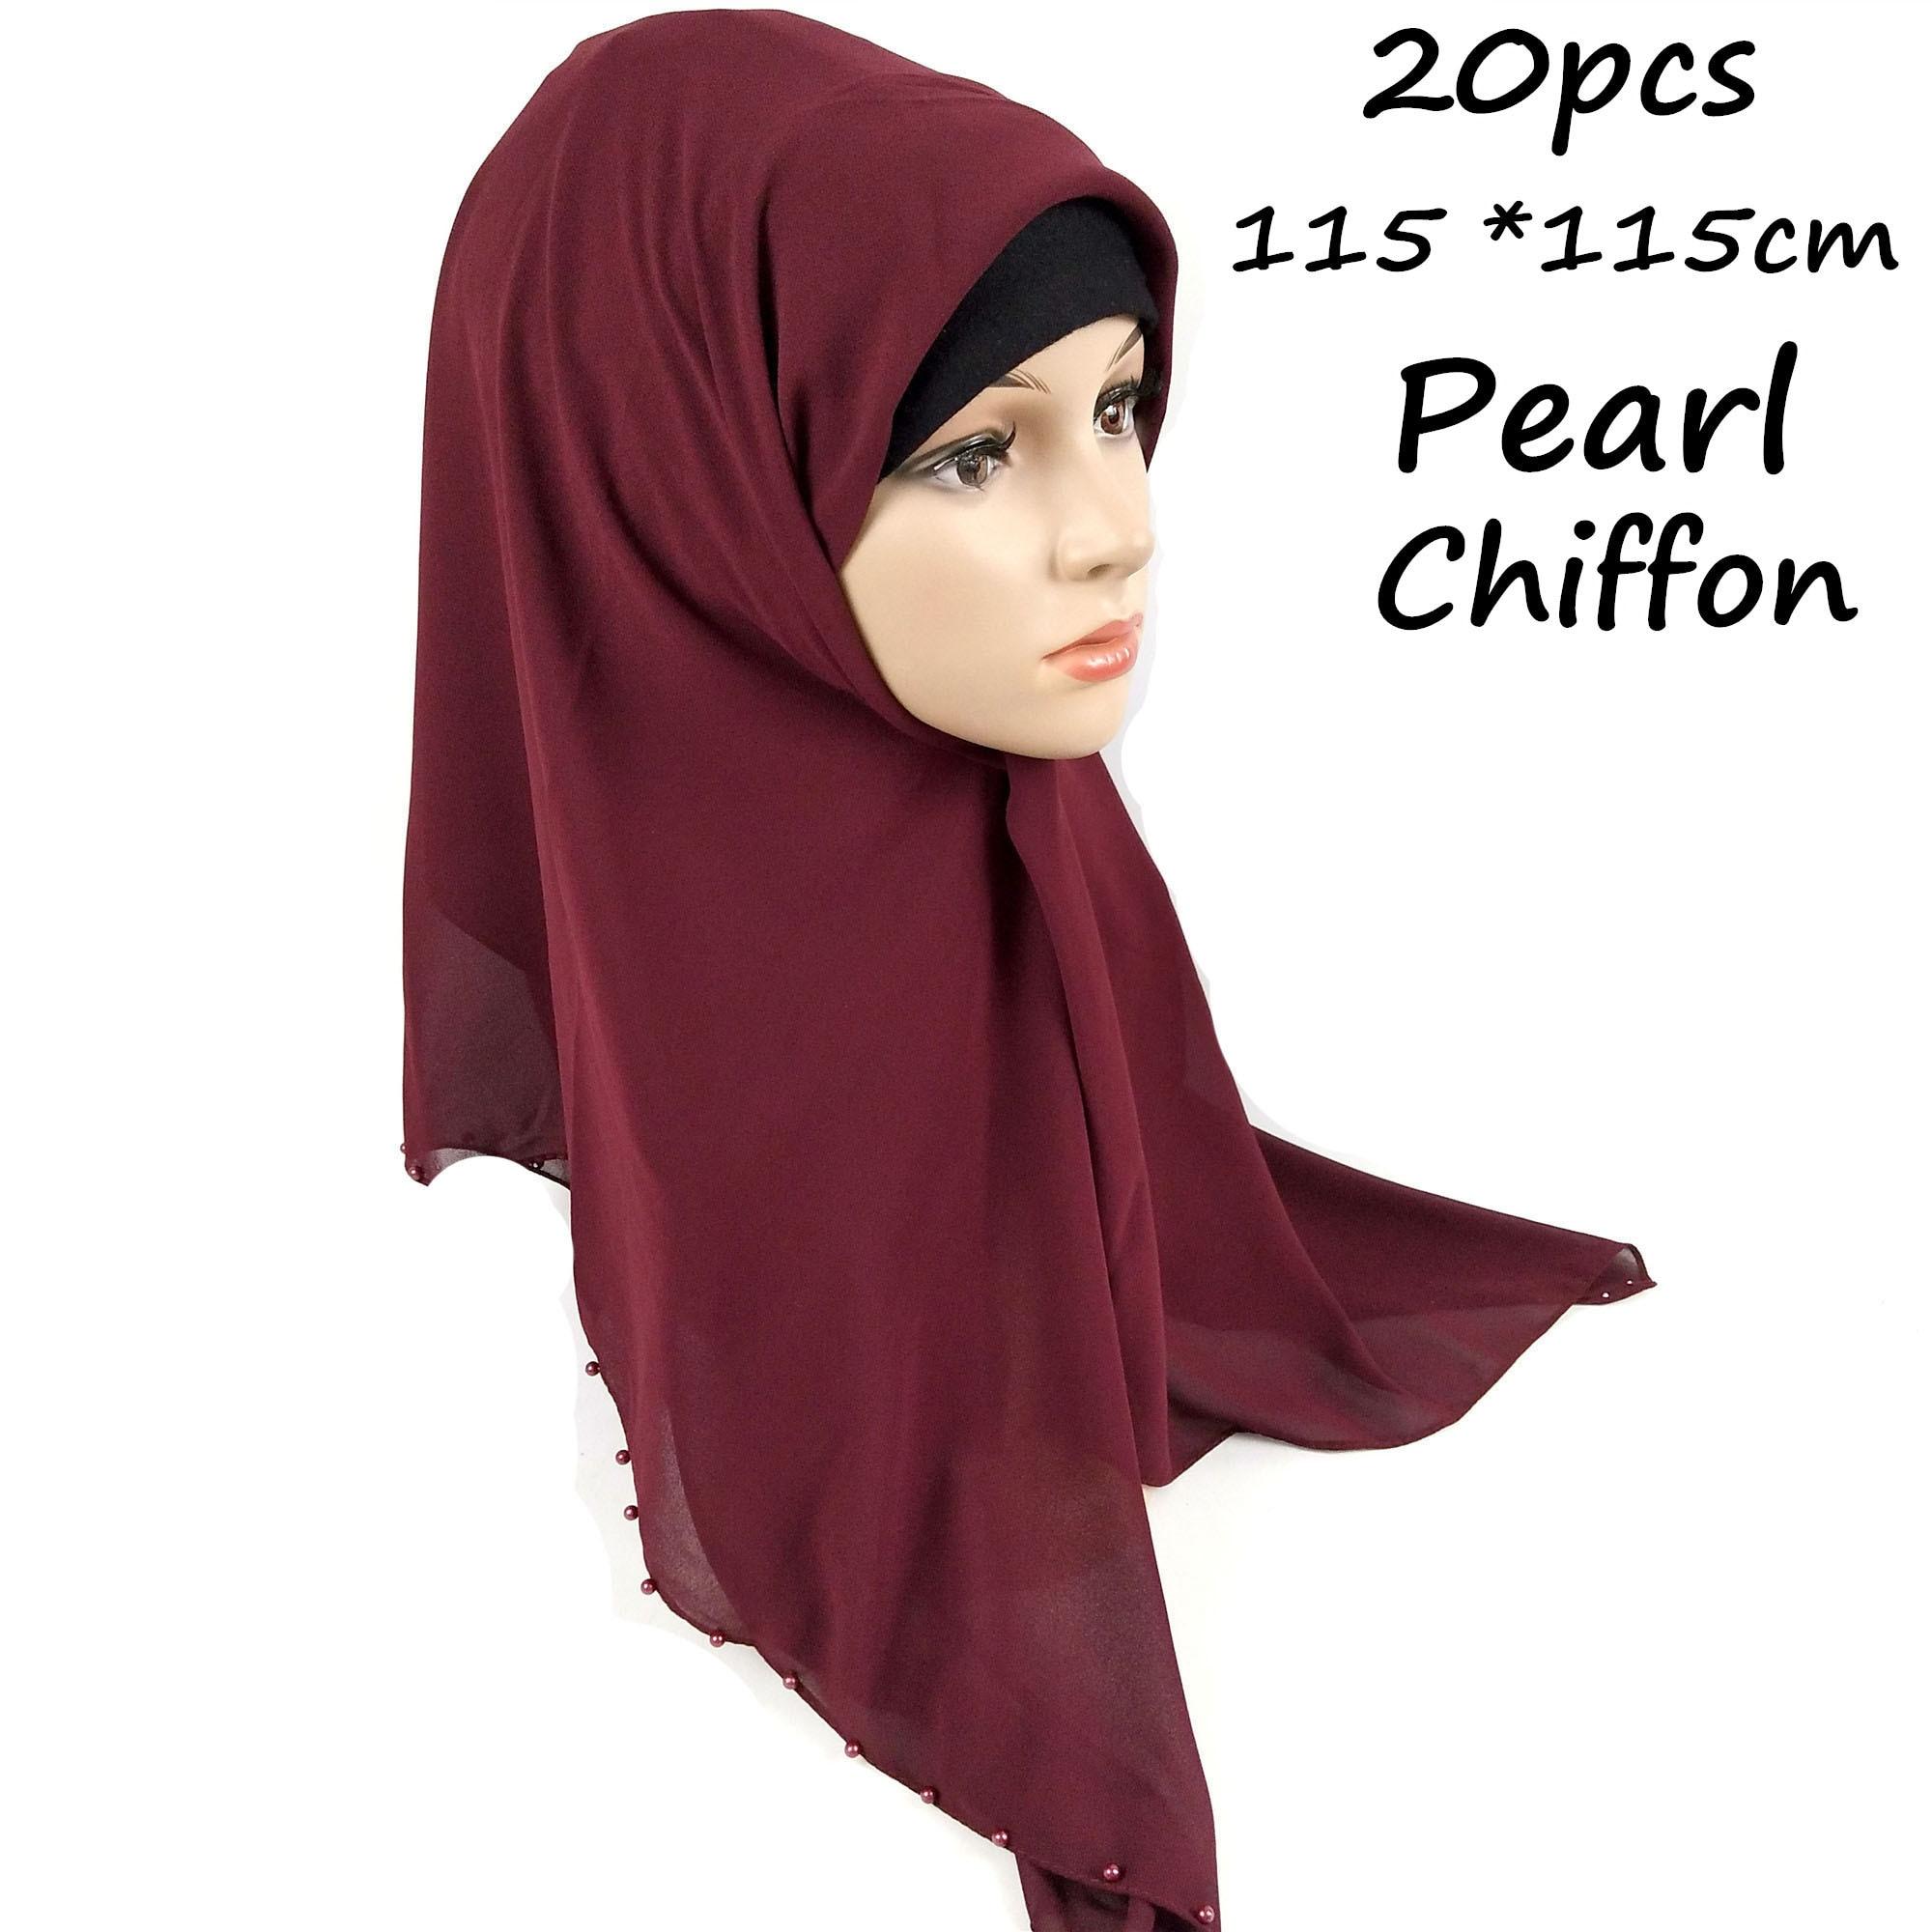 H11 20pcs  High Quality Bead Square Chiffon Hijab 115 *115cm  Wrap Shawls Women Scarves Scarf  Long Shawl Top Sell